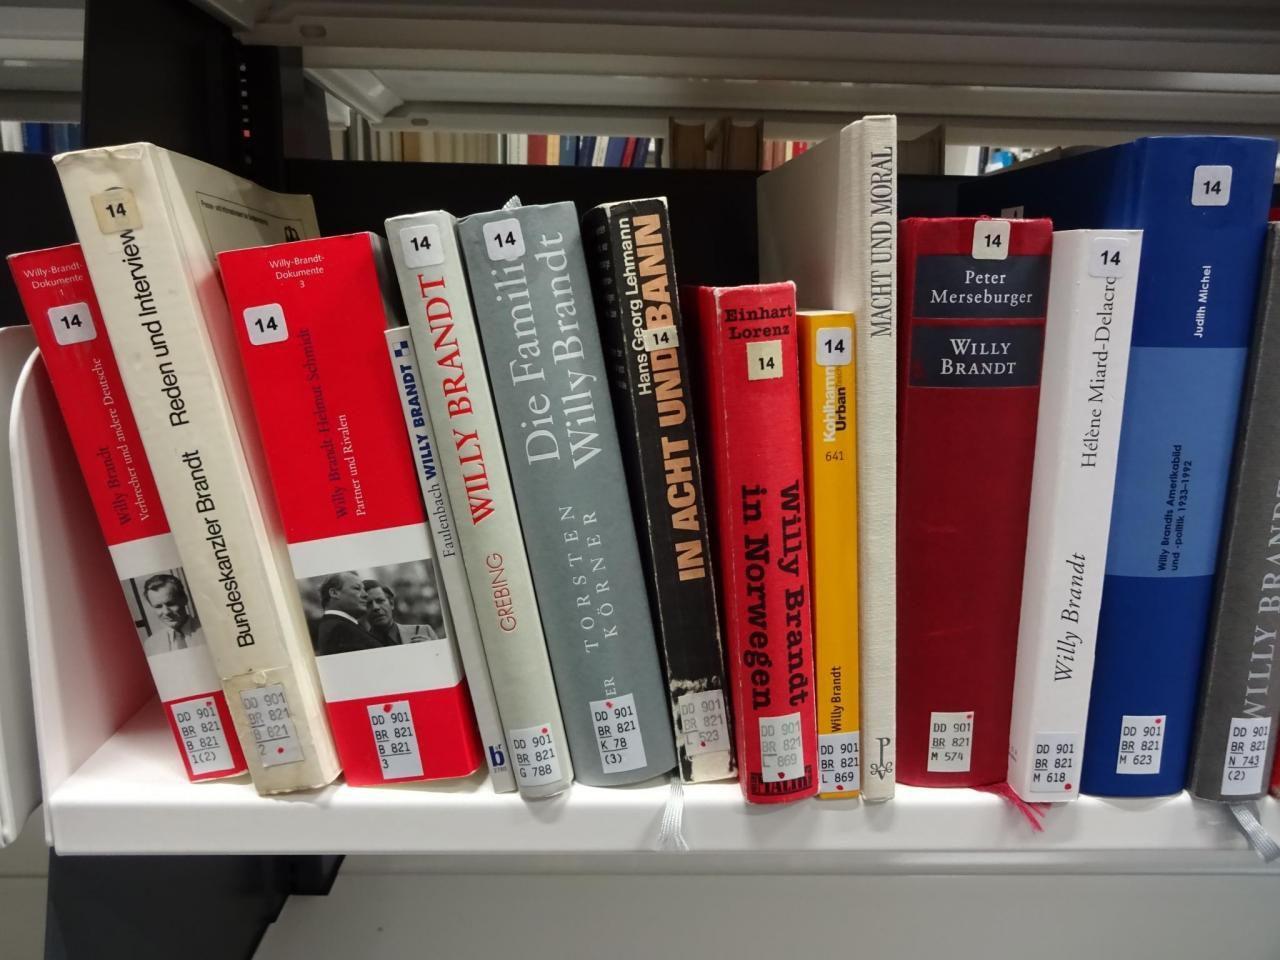 Politikhistorische Biografik über Willy Brandt, Universitätsbibliothek Bielefeld 2019. Foto: Levke Harders, Lizenz: [https://creativecommons.org/licenses/by-nc-sa/4.0/deed.de CC BY-NC-SA 4.0]